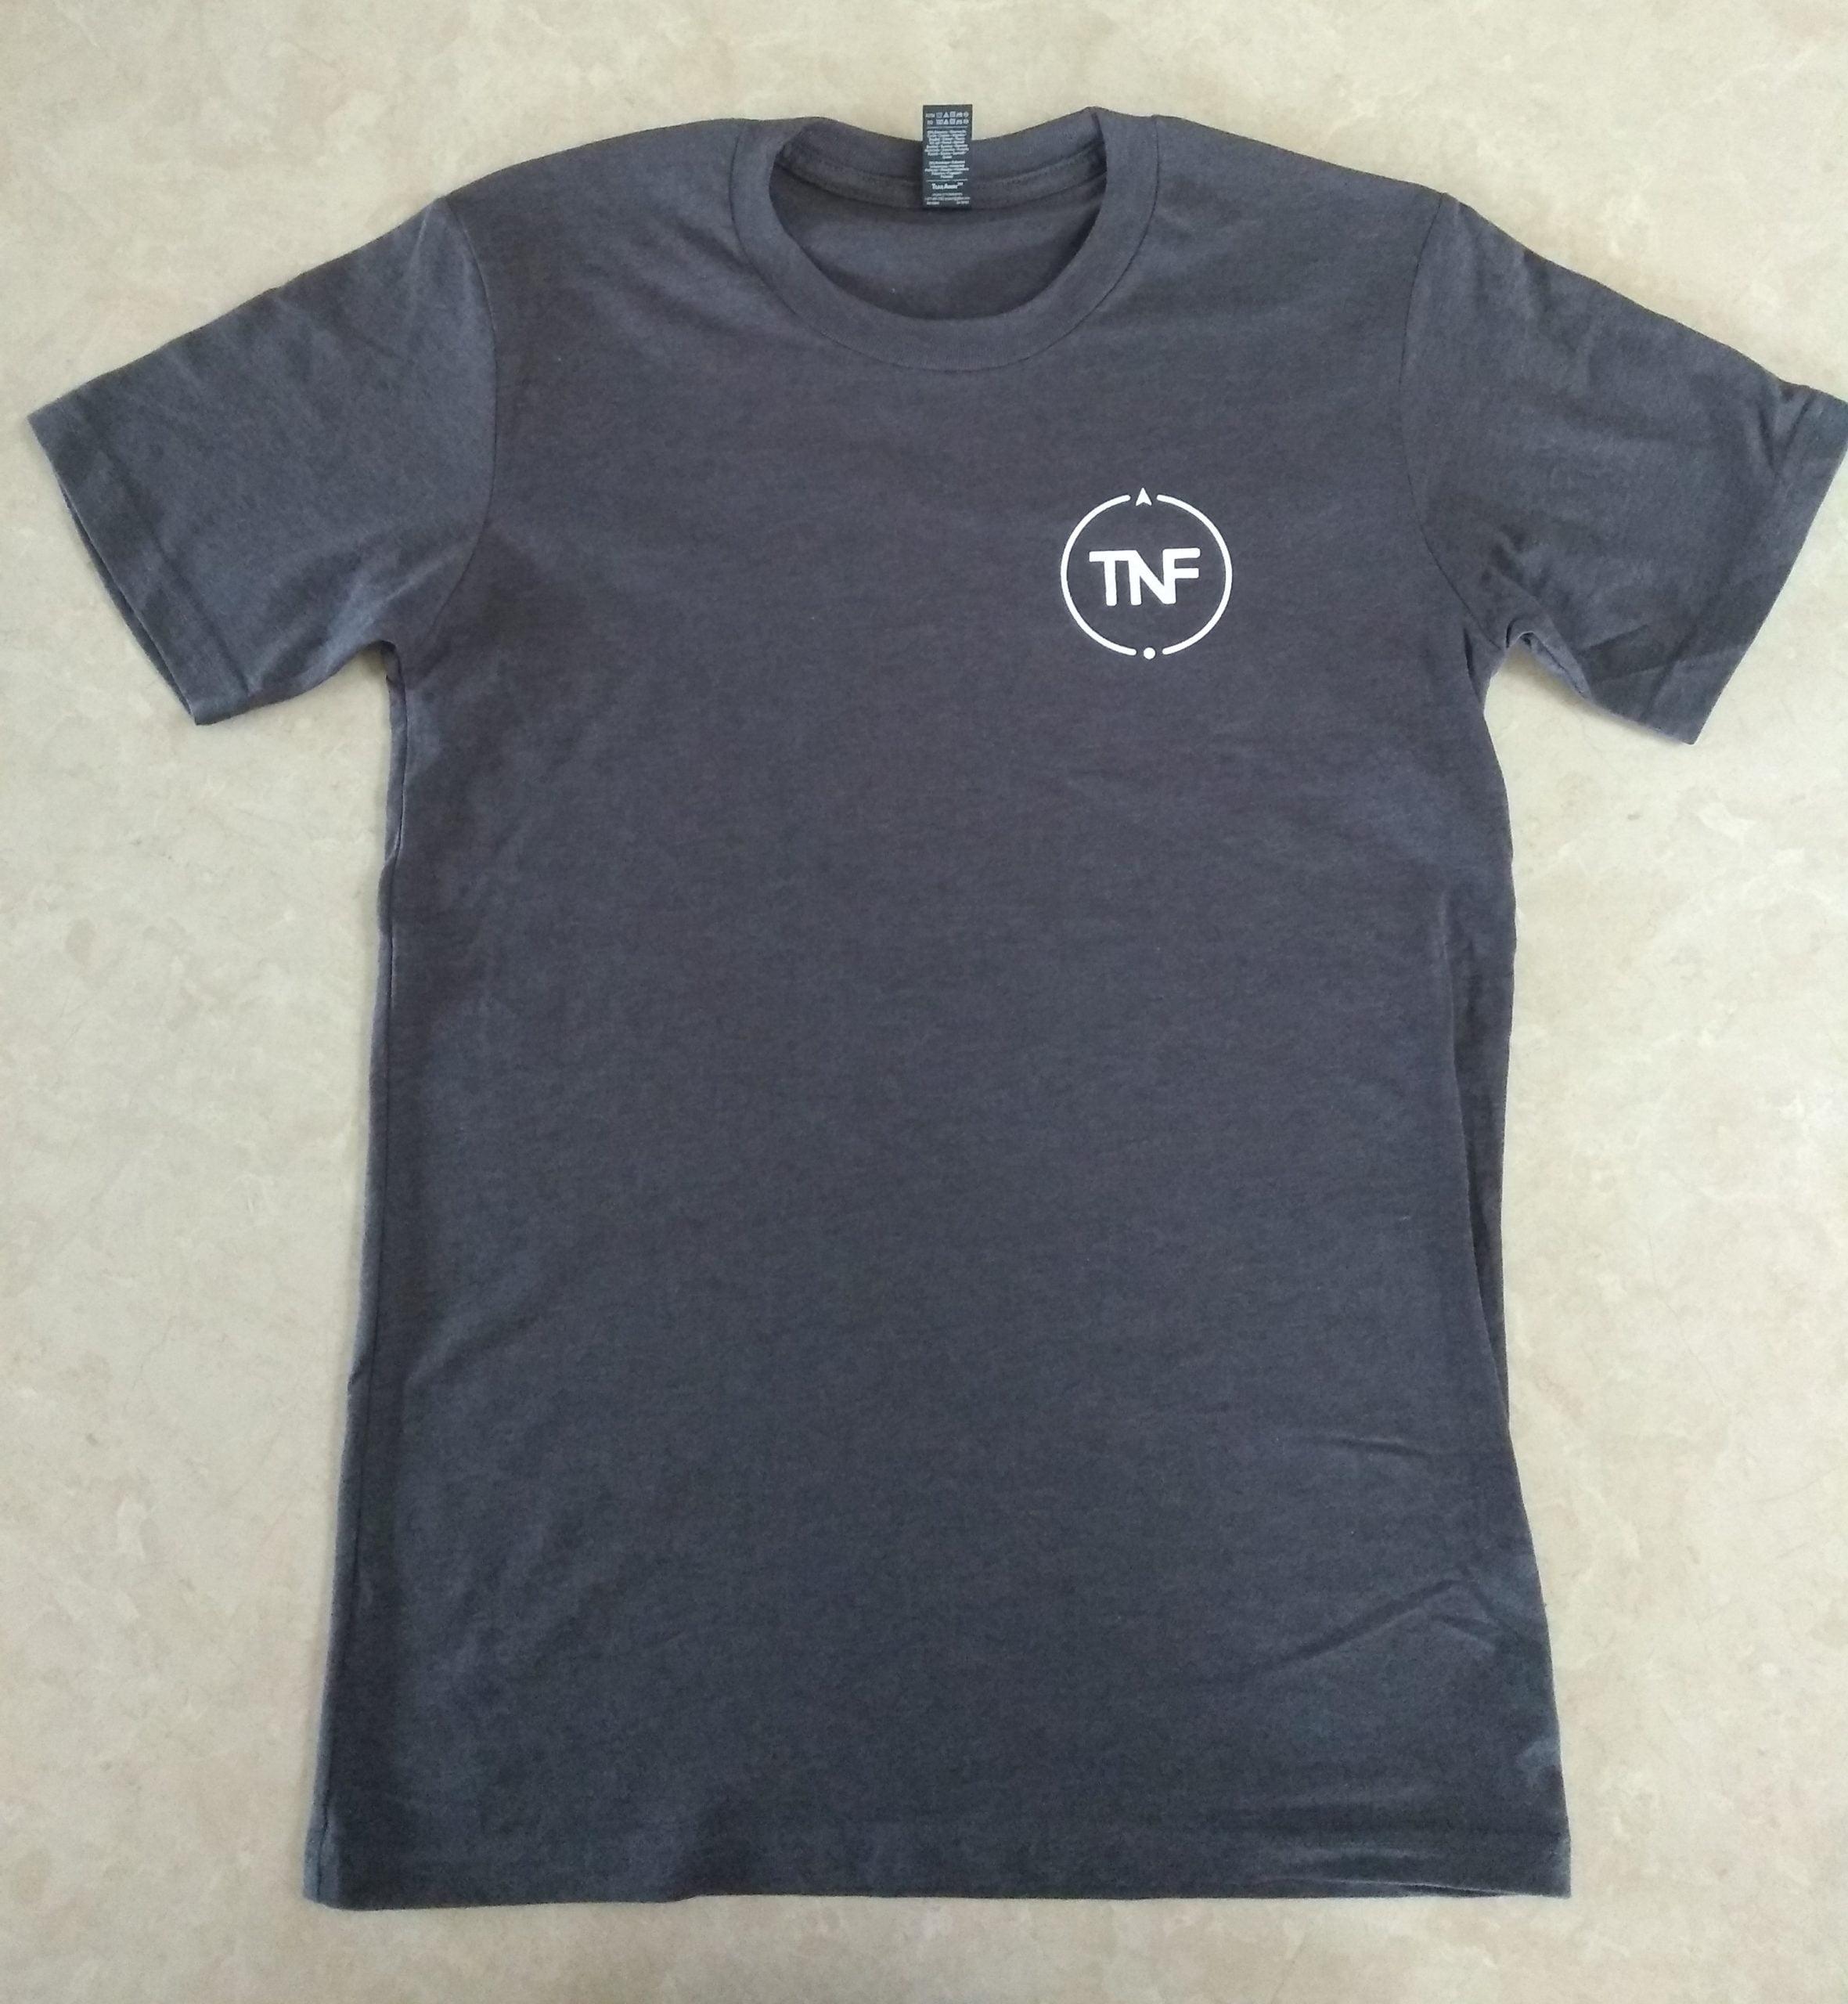 TNF Grey T-Shirt (Front)